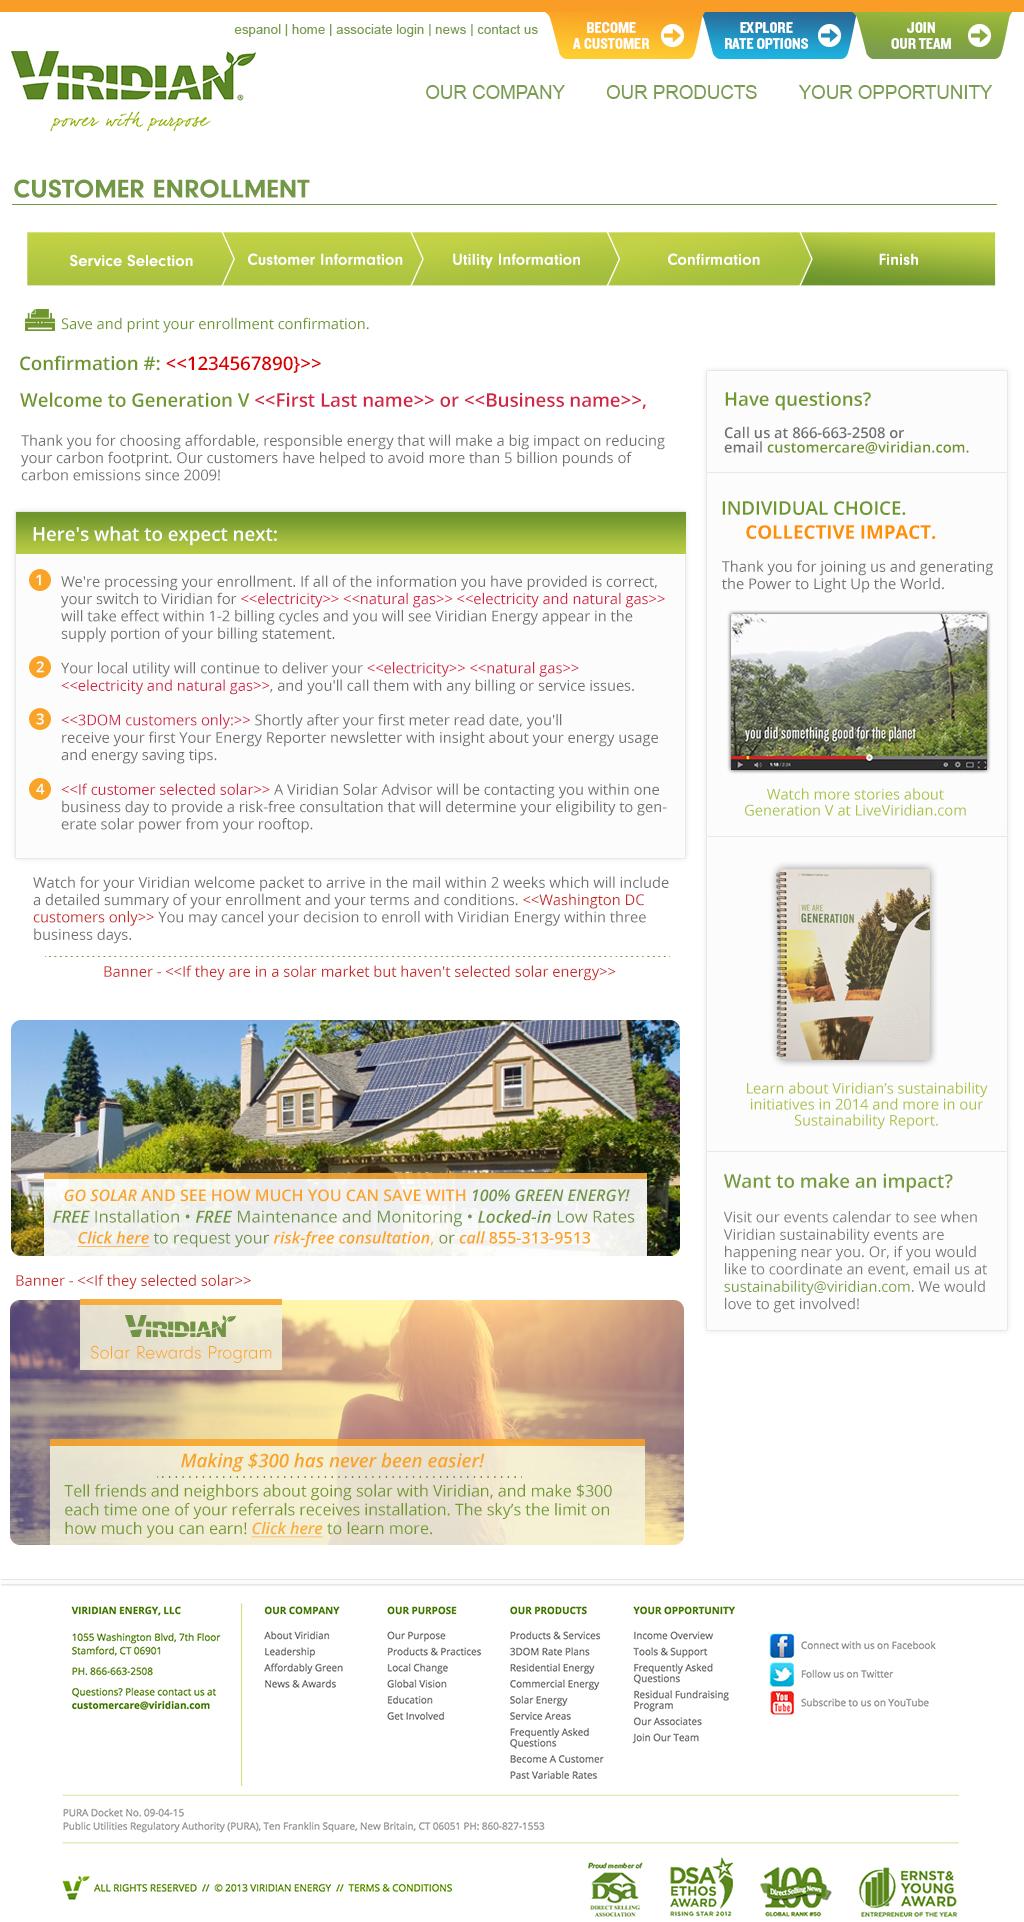 Customer Enrollment Screens 04282015_Page_11